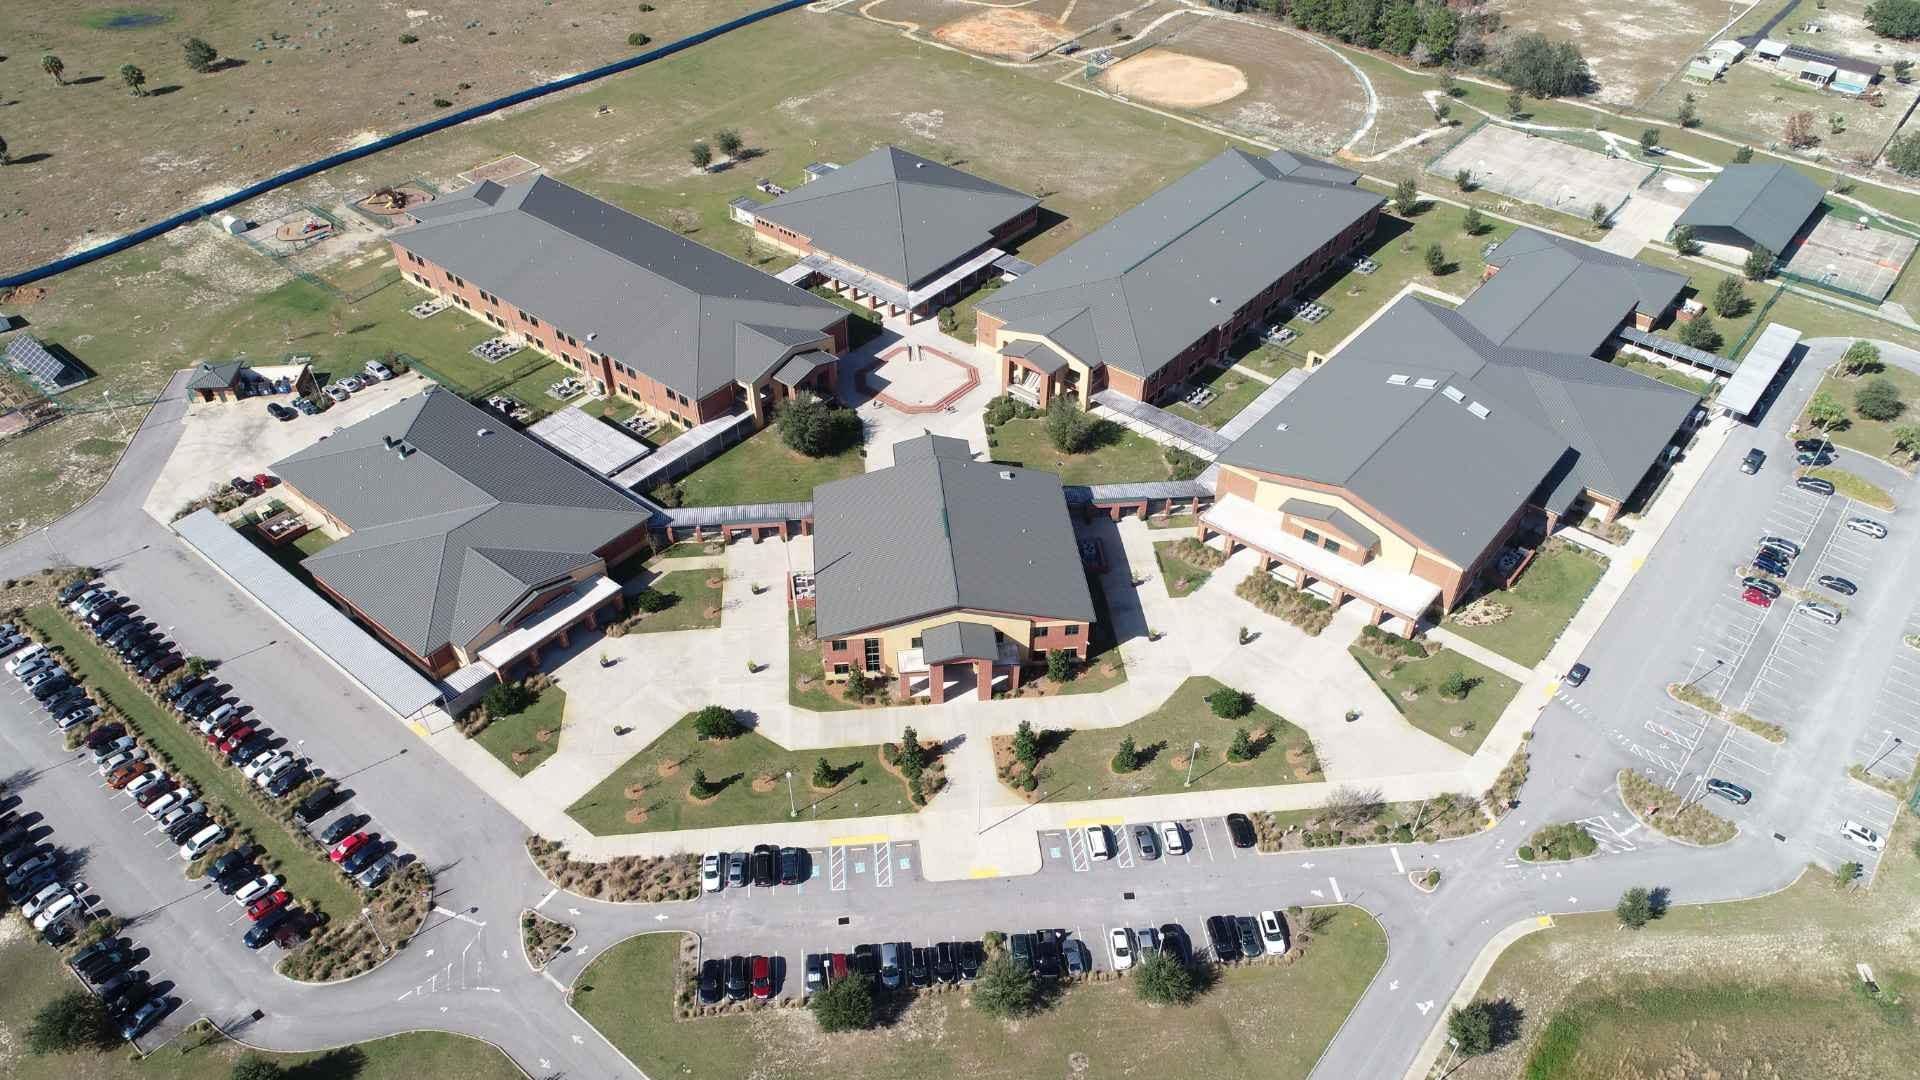 An overhead view of the Davenport School buildings